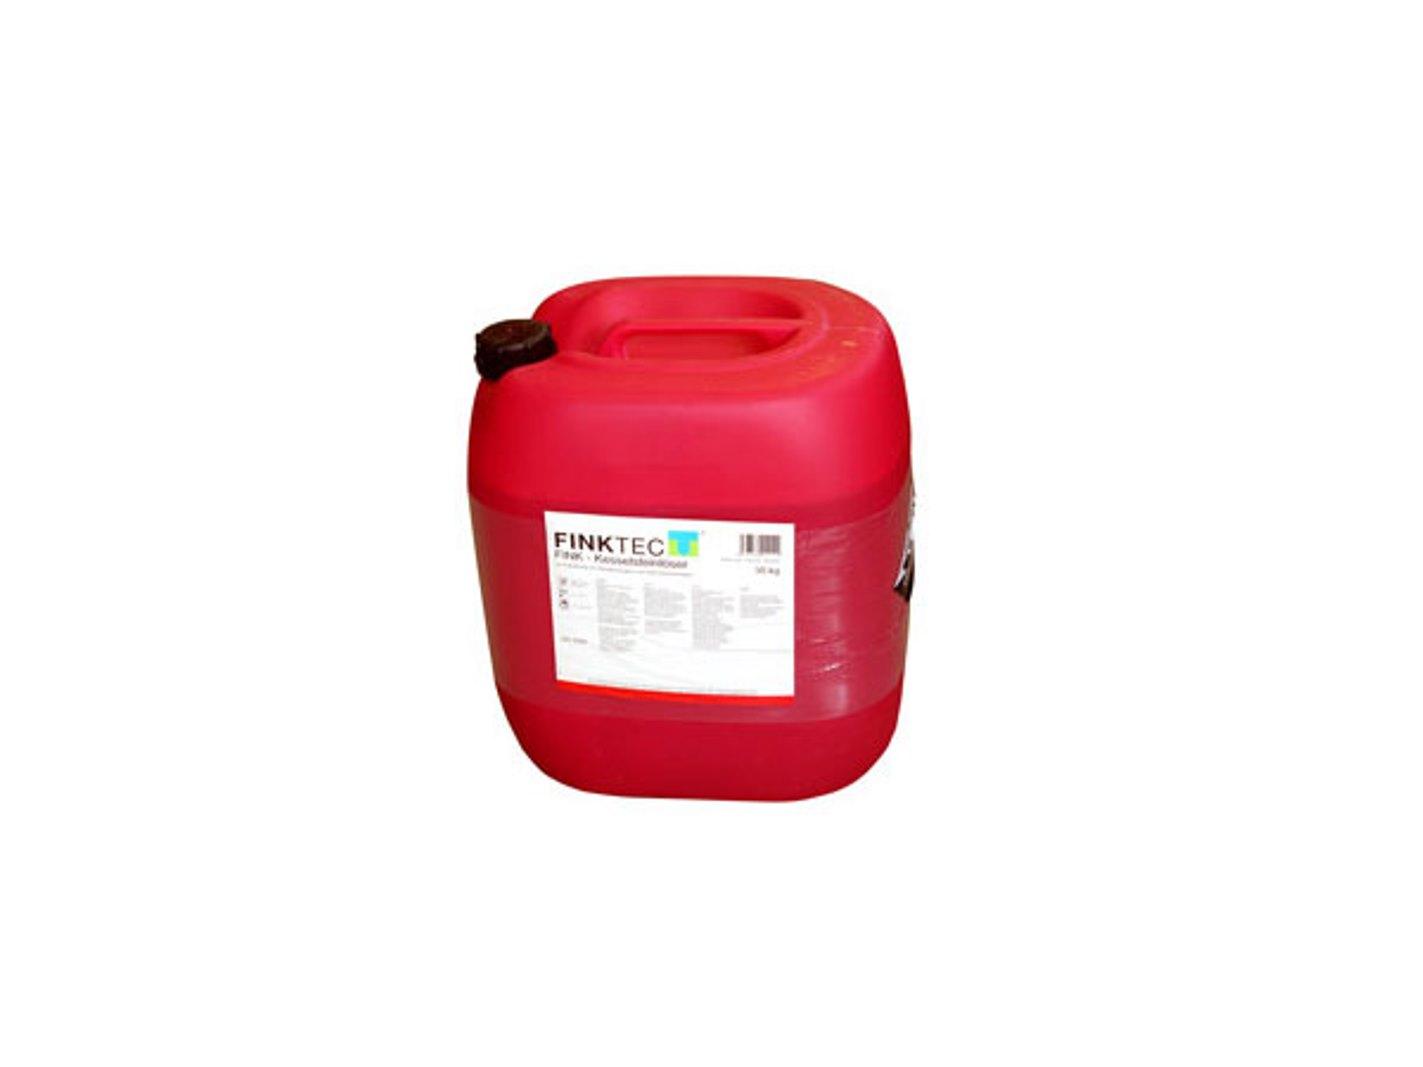 Средство для удаления накипи, 25кг Rothenberger Fink-kesselsteinloser 61110fr чистящее средство для кофемашины siemens таблетки для удаления накипи tz80002